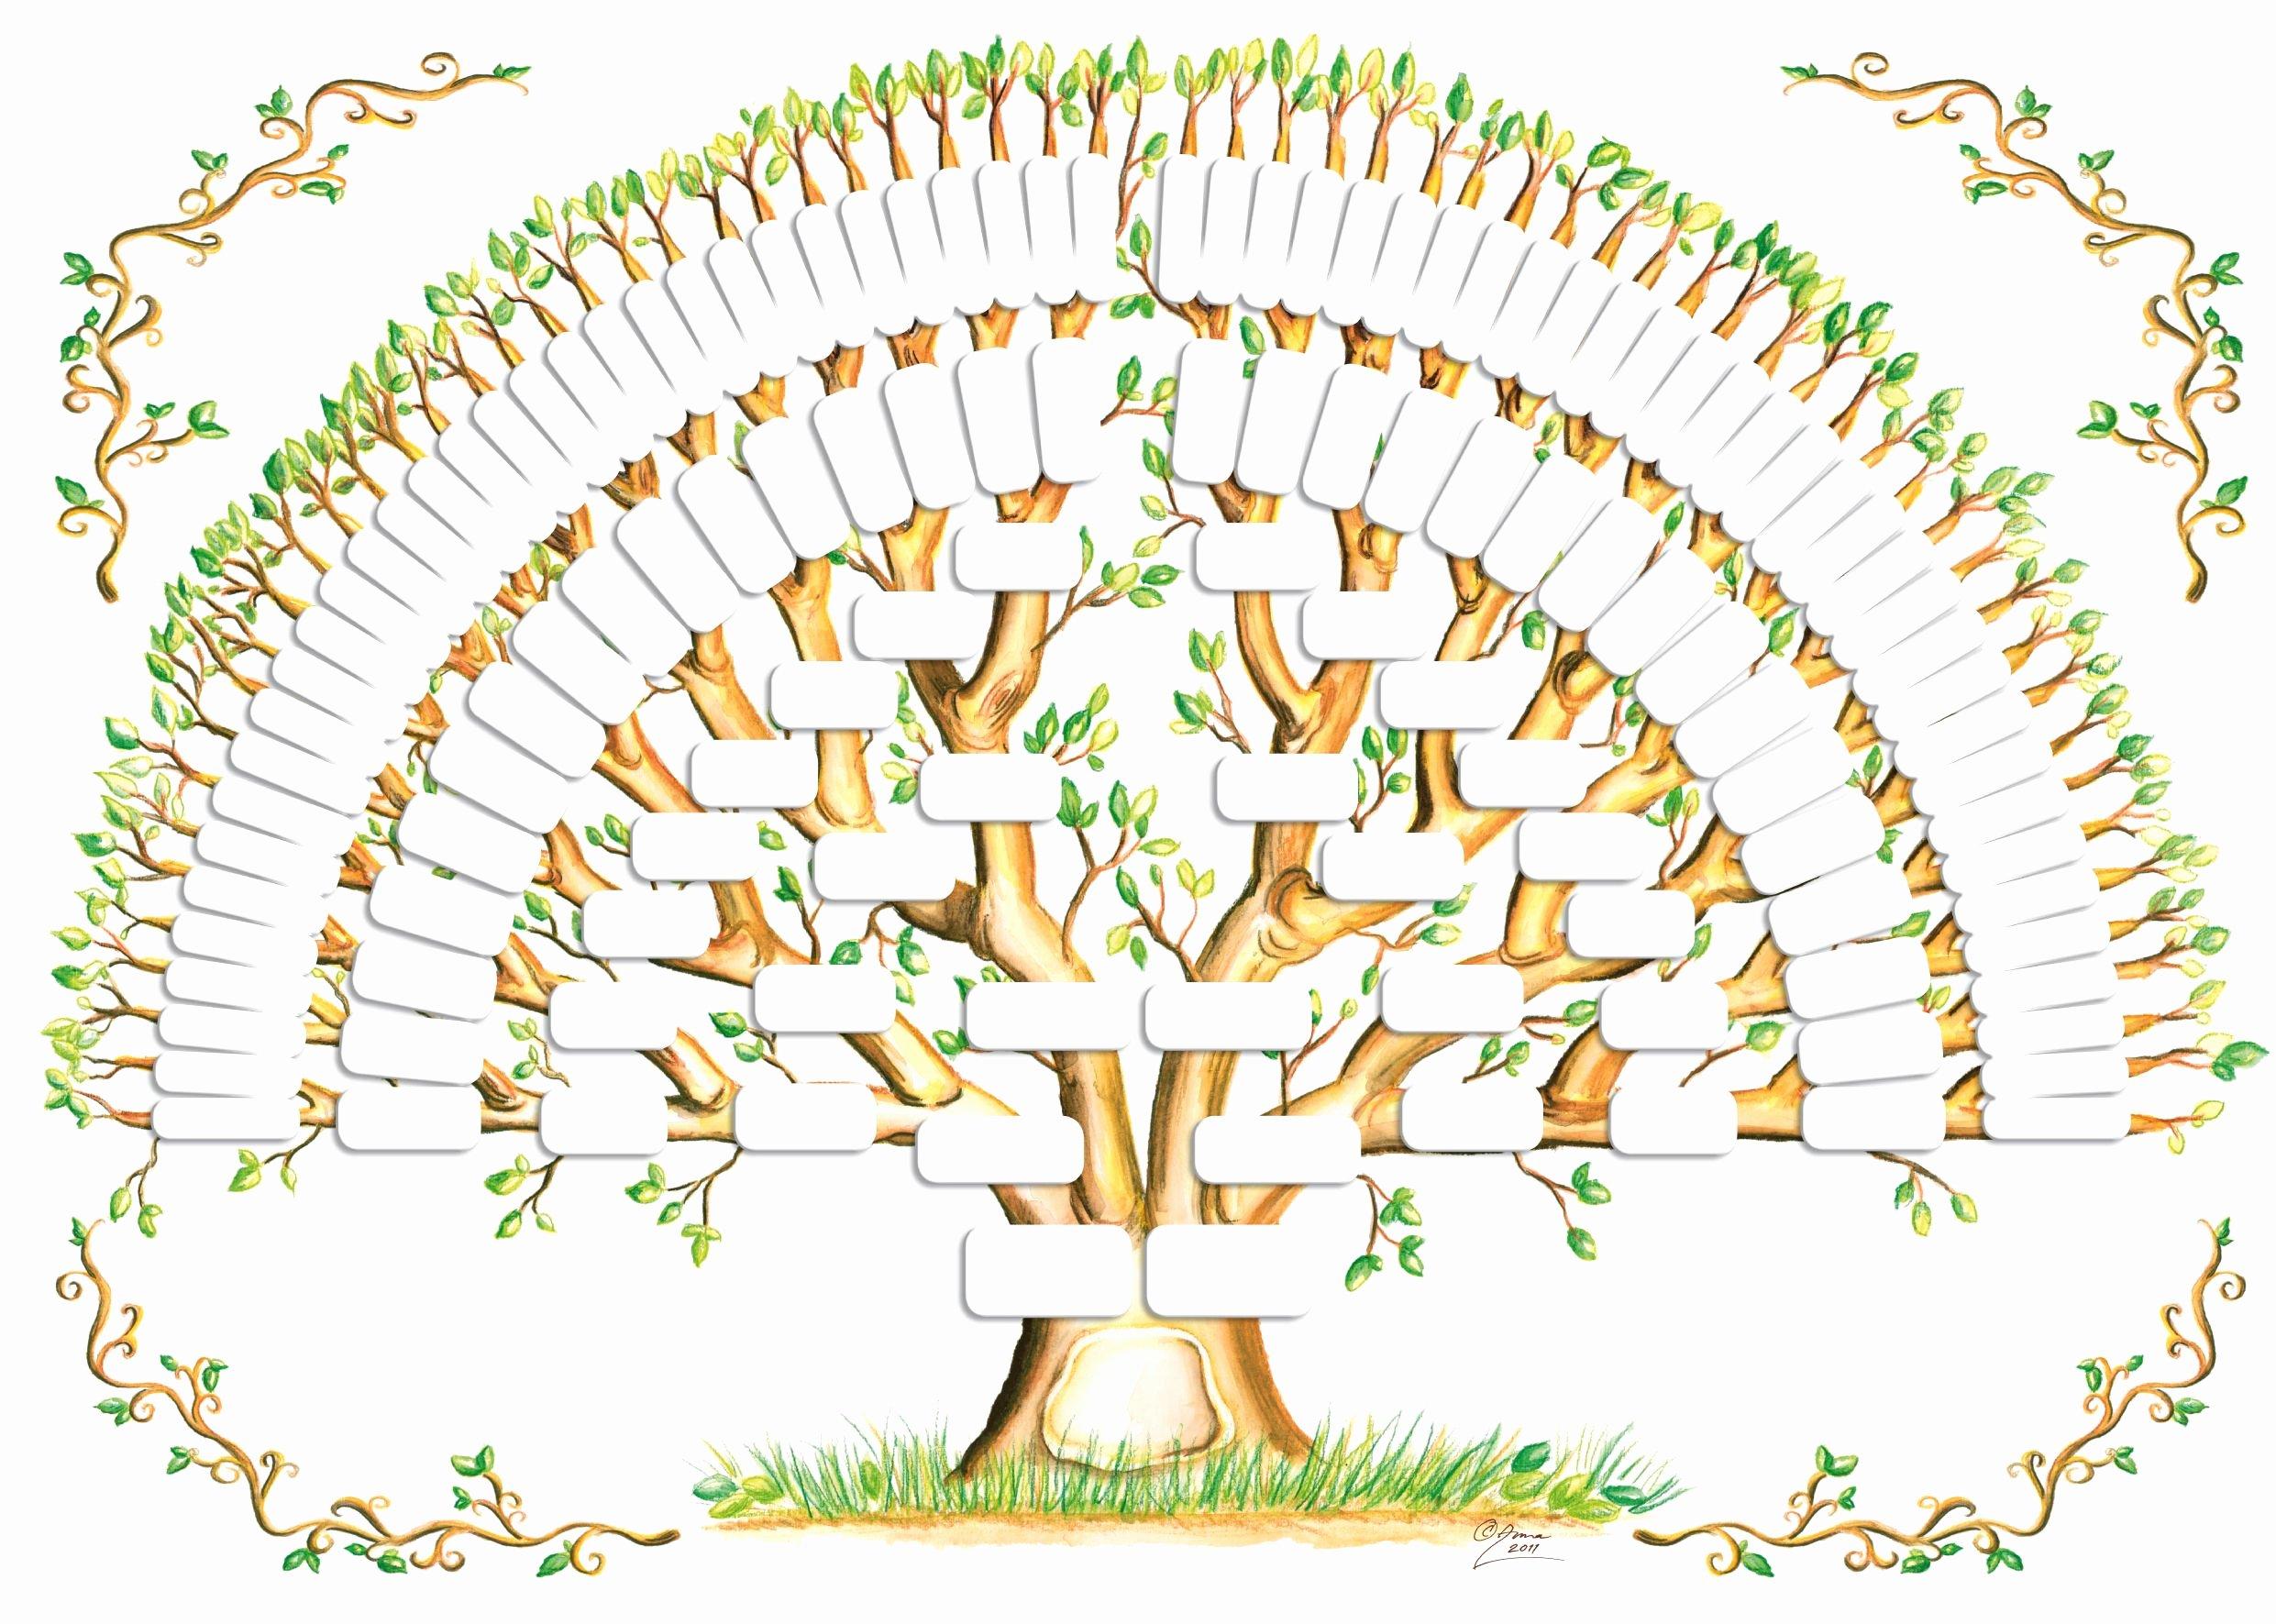 Blank Family Tree Poster Fresh 5 Generation Family Tree Template Tree Gallery